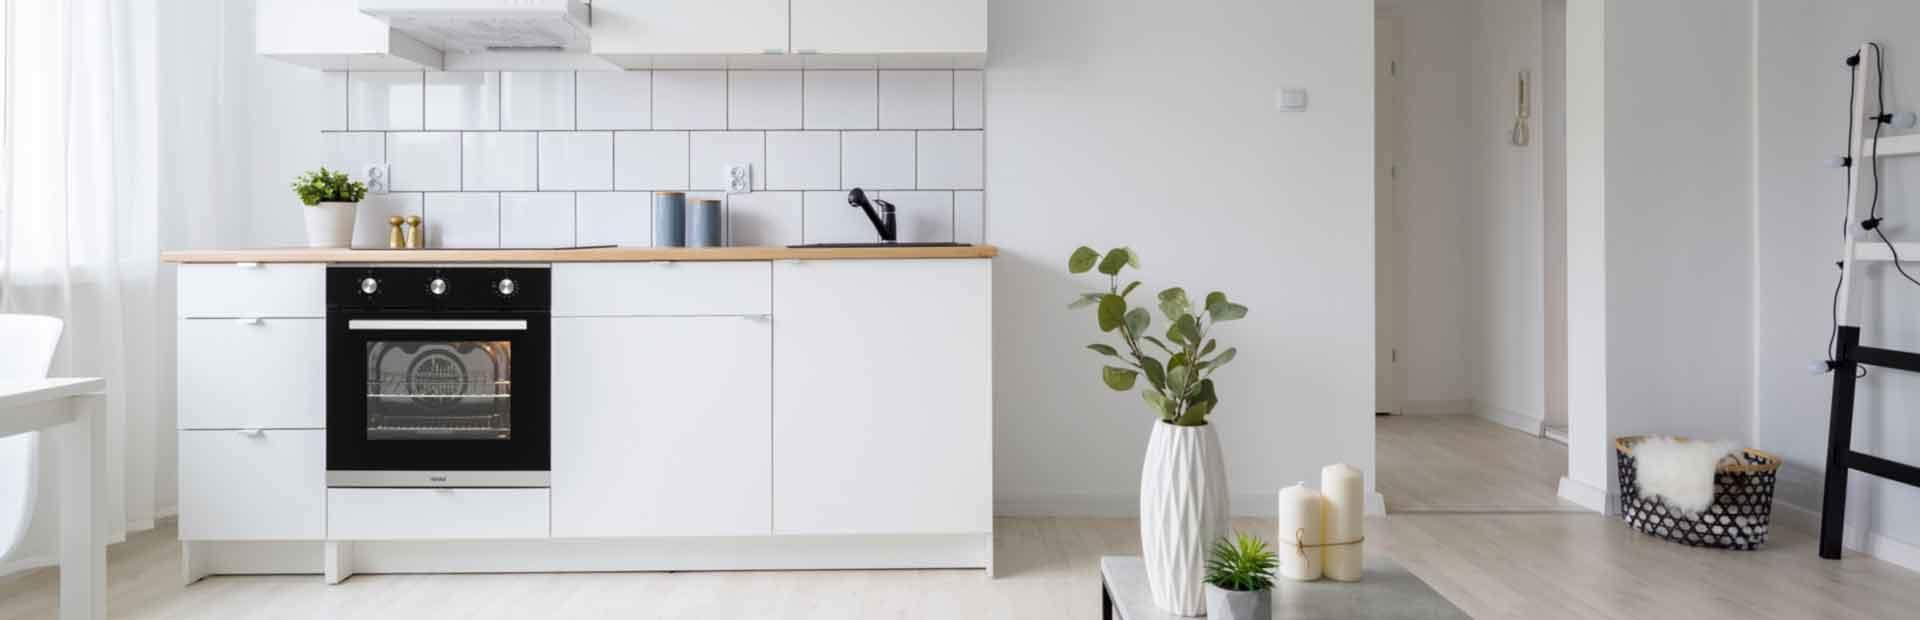 Venini Appliance Repairs